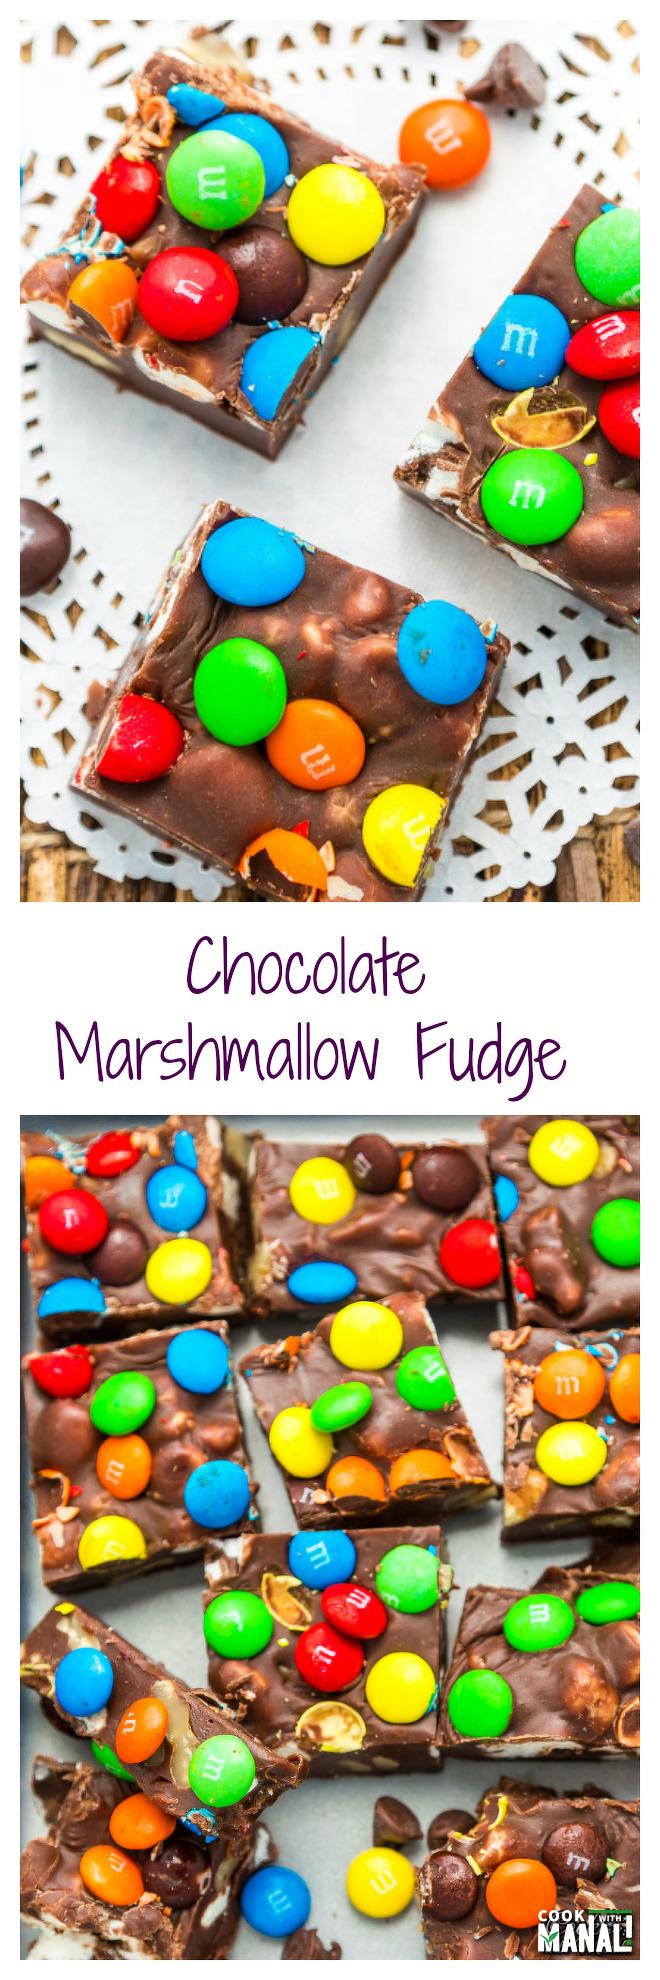 Chocolate-Marshmallow-Fudge-Collage